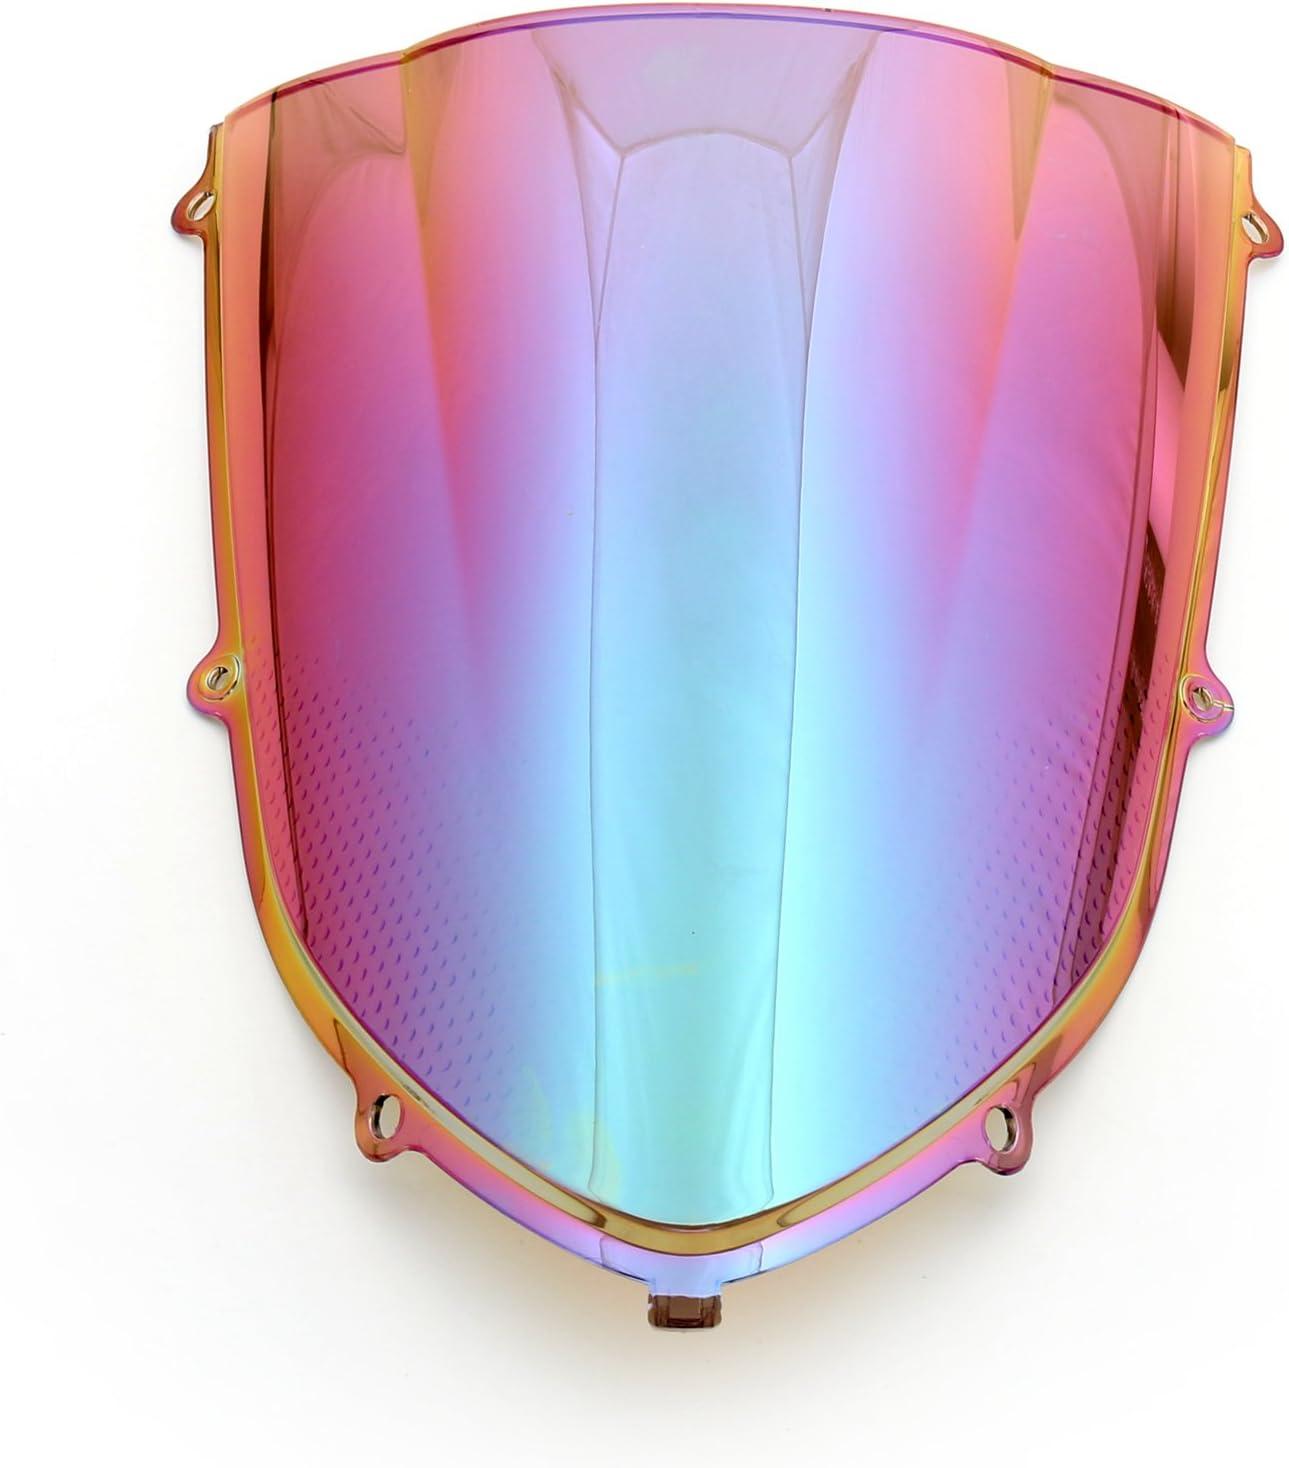 Artudatech Parabrisas de motocicleta de doble burbuja frontal parabrisas para motocicleta K-A-W-A-S-A-K-I ZX10R ZX 10R 2004-2005.